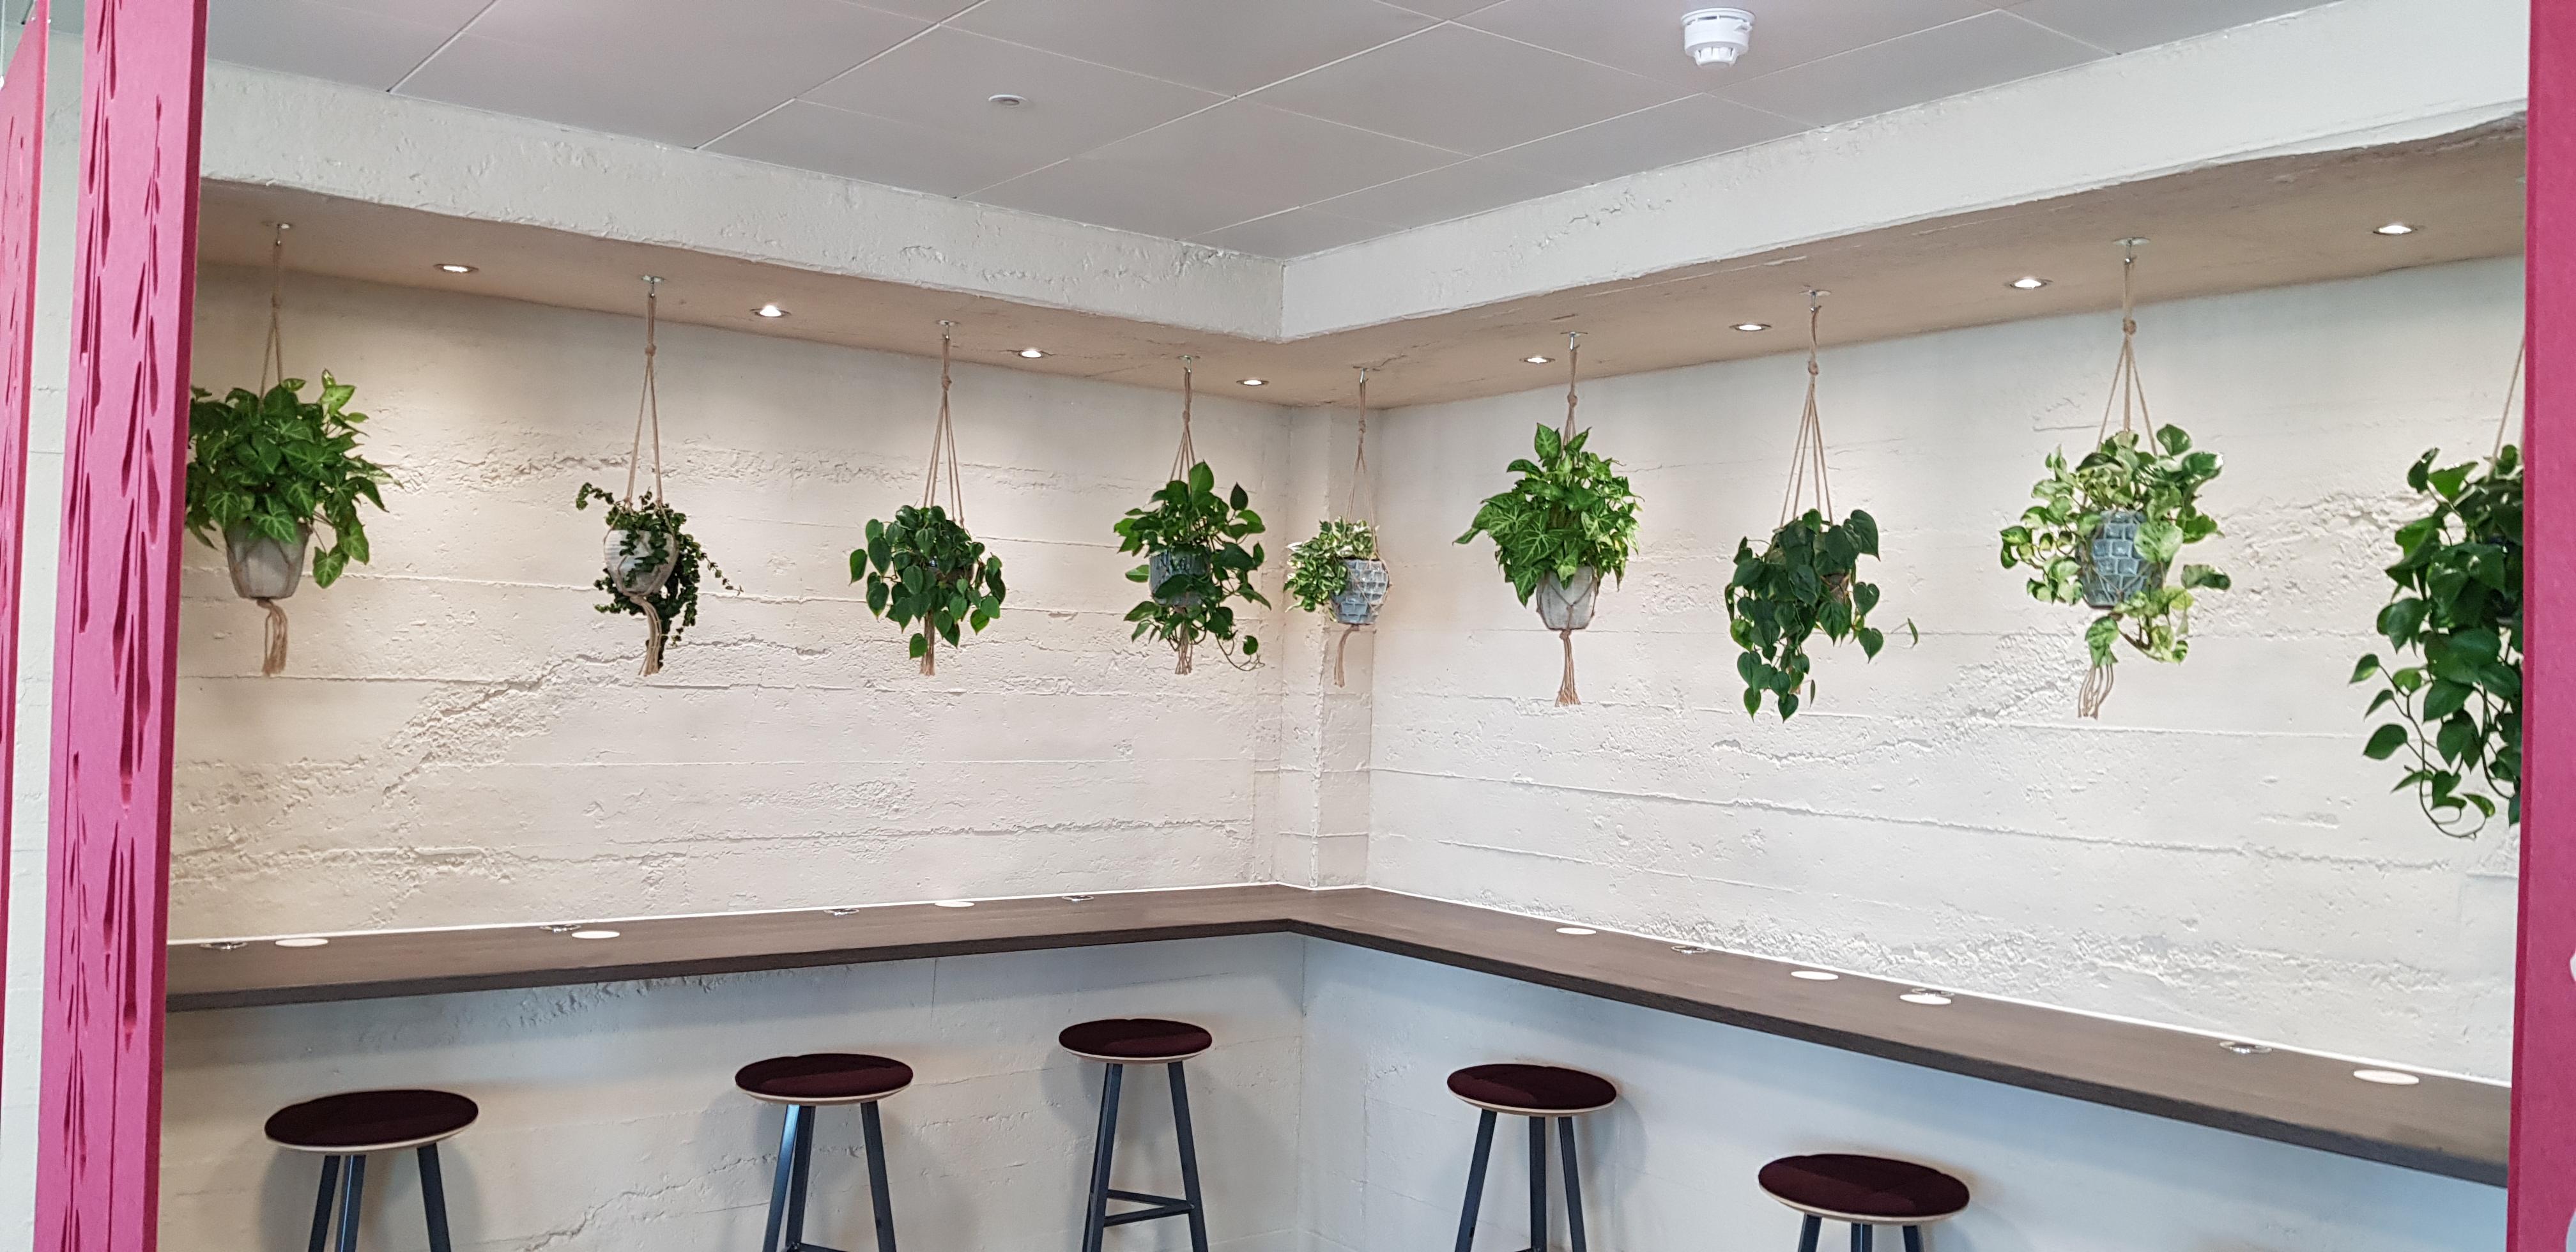 Slough Hanging Displays